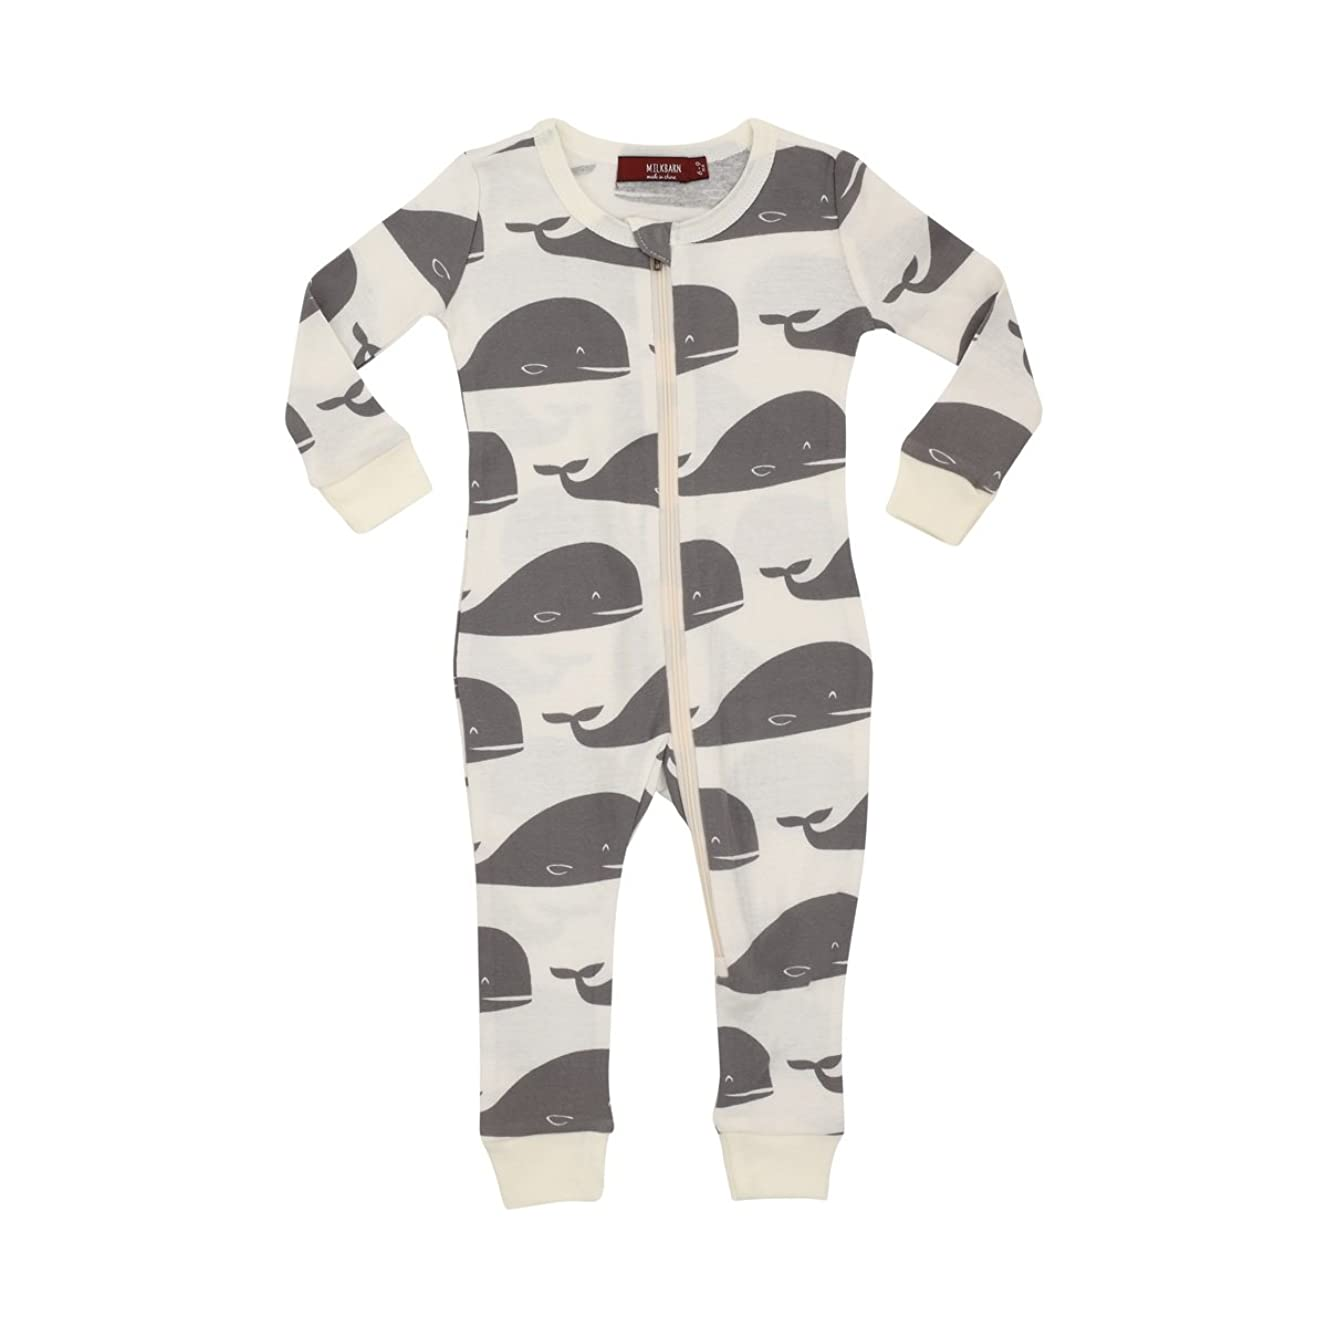 MilkBarn Organic Cotton Zipper Pajama - Grey Whale